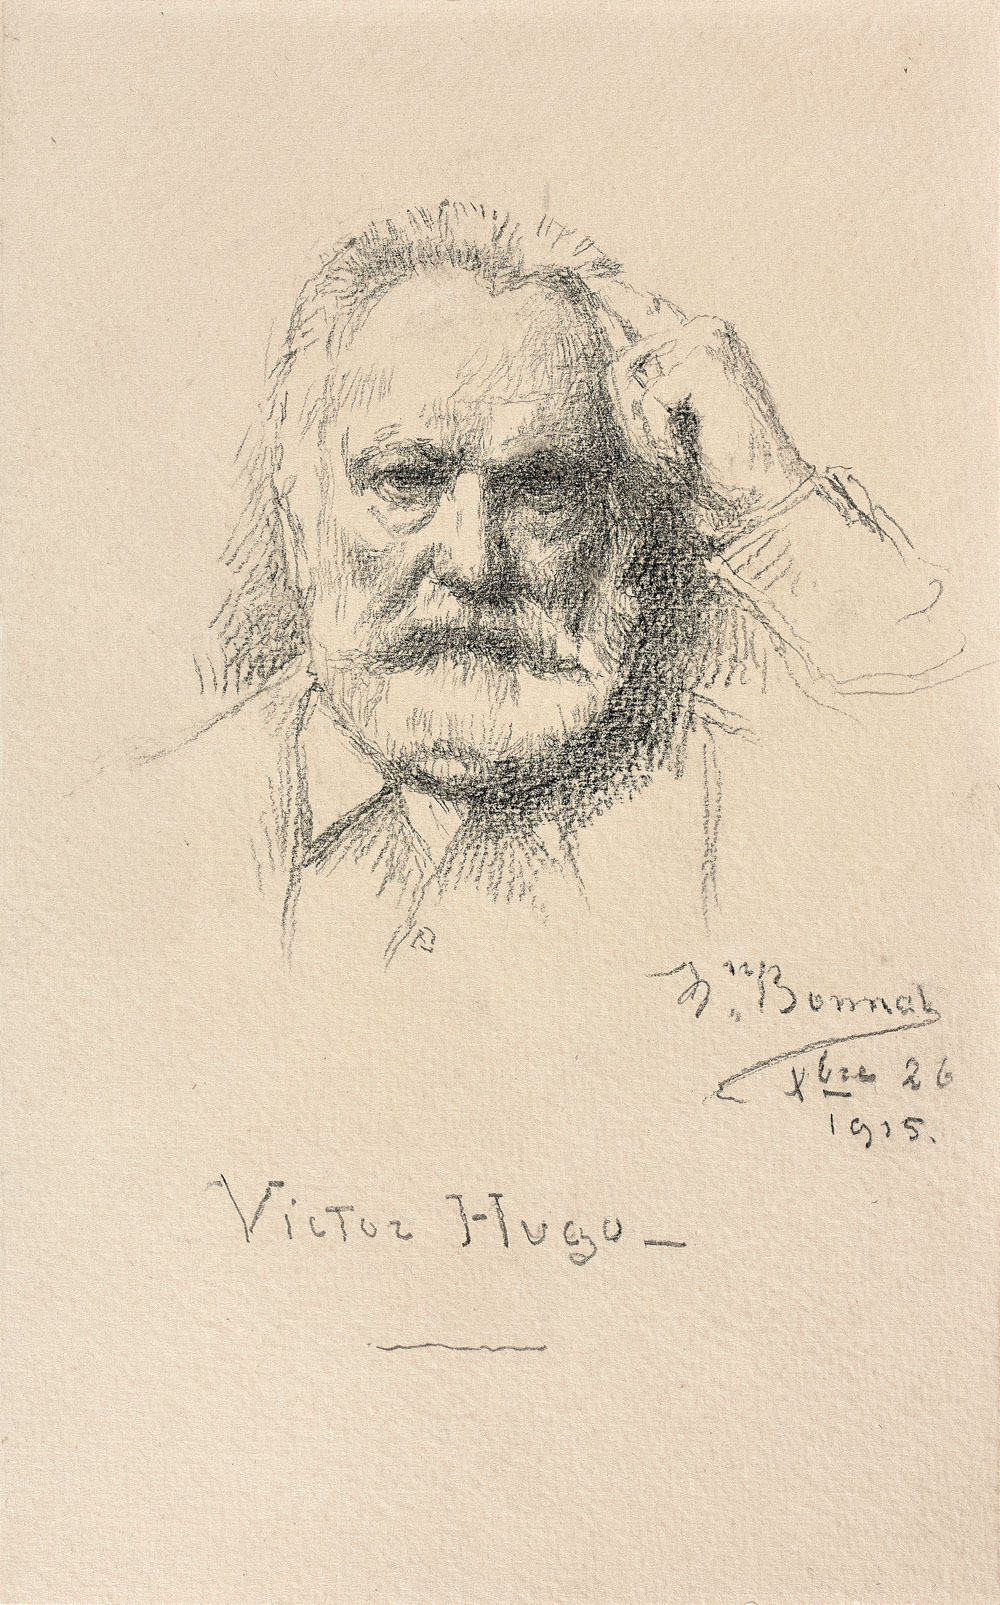 Portrait de Victor Hugo (1802-1885)